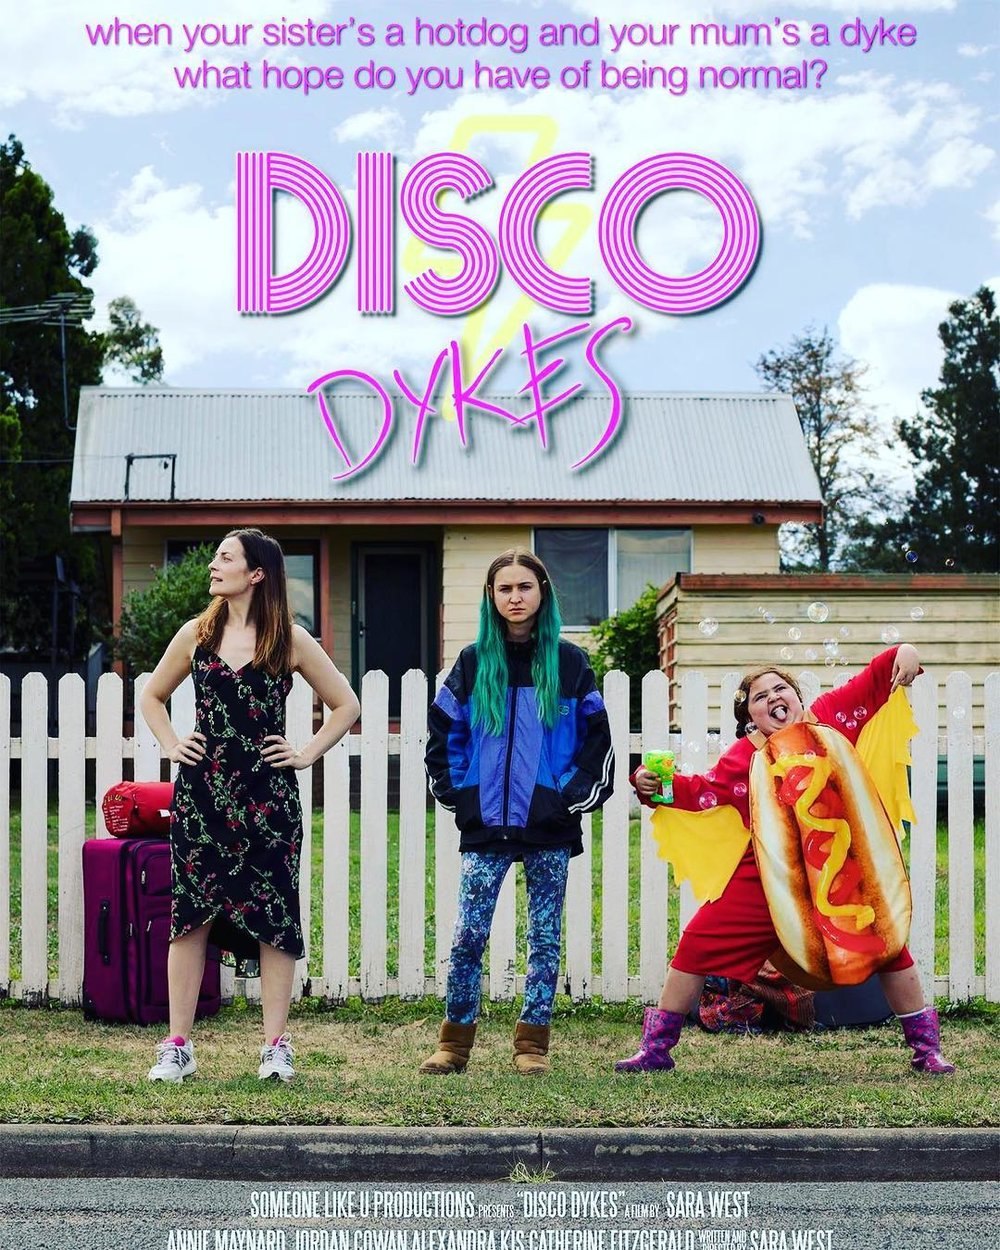 disco dykes.jpg